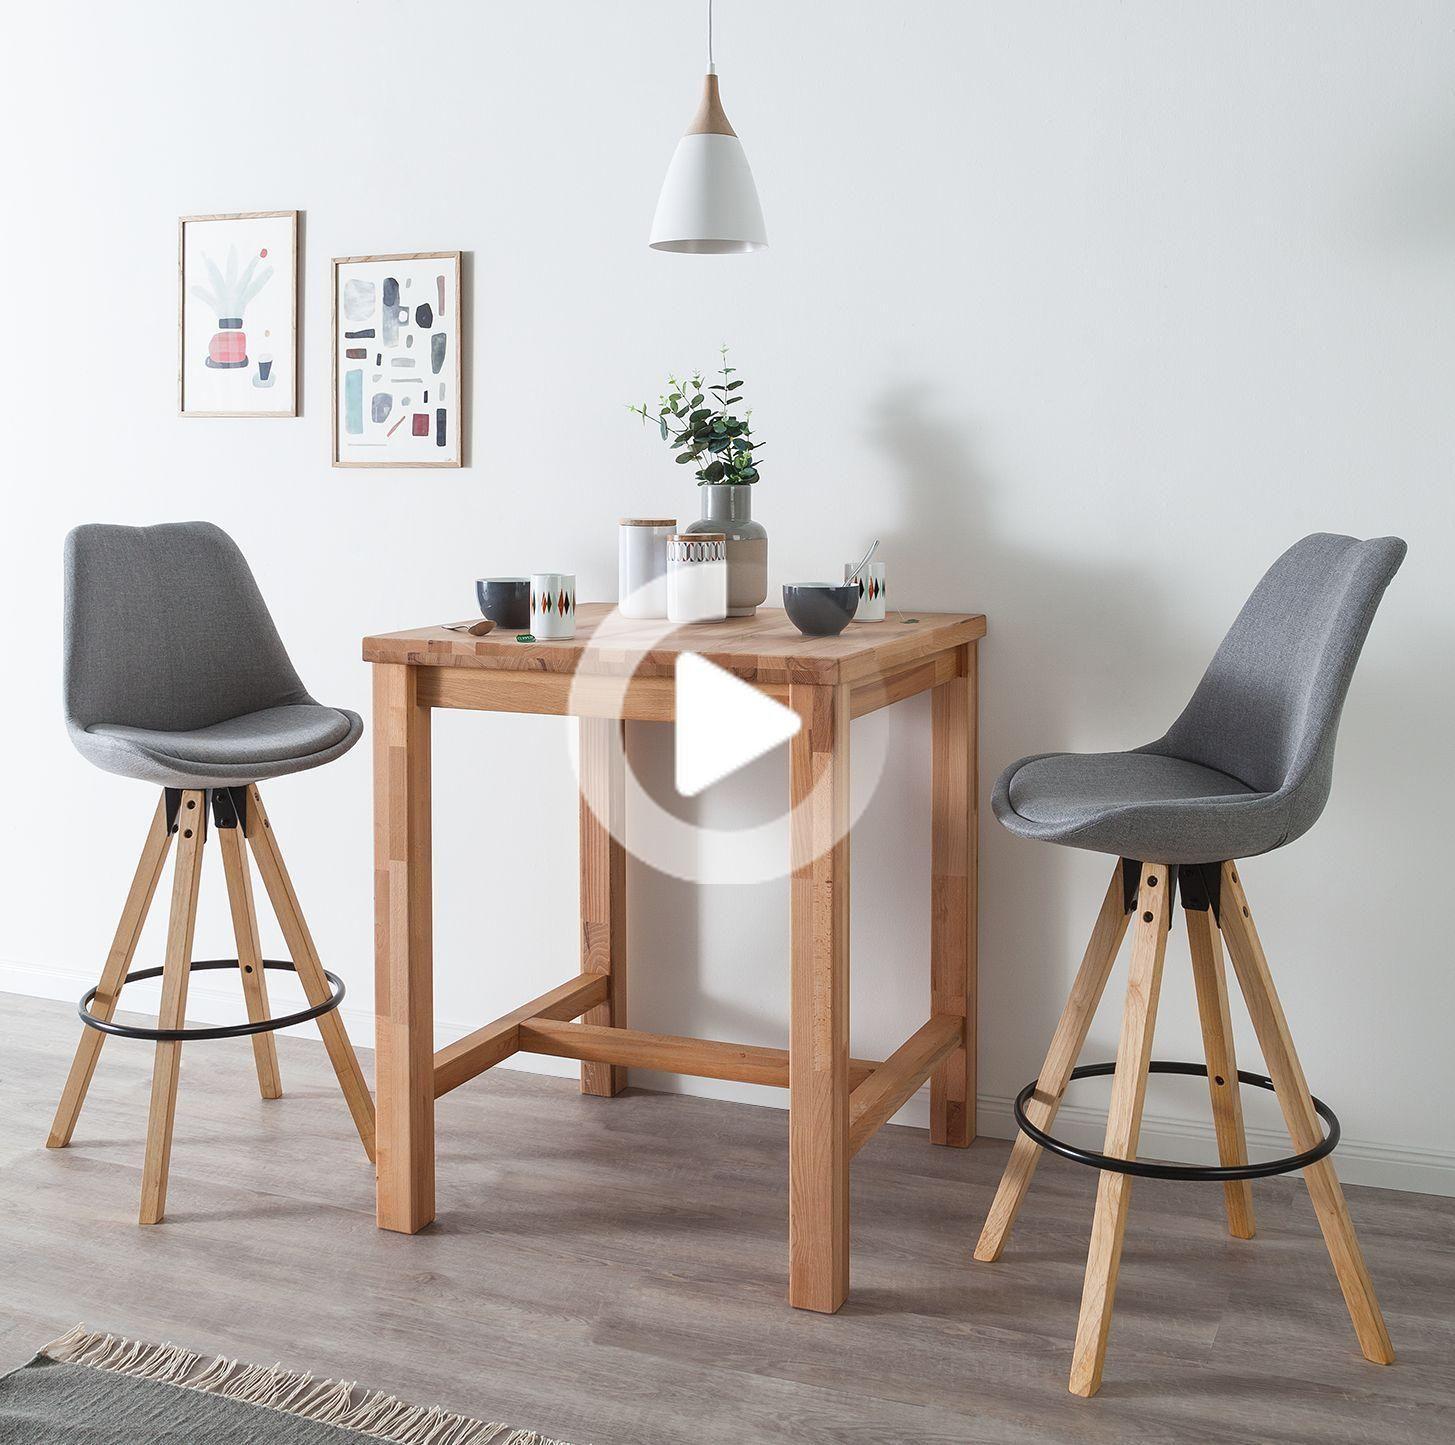 Barstuhl Aledas Ii 2er Set In 2020 Minimal Furniture Furniture Small Bathroom Decor